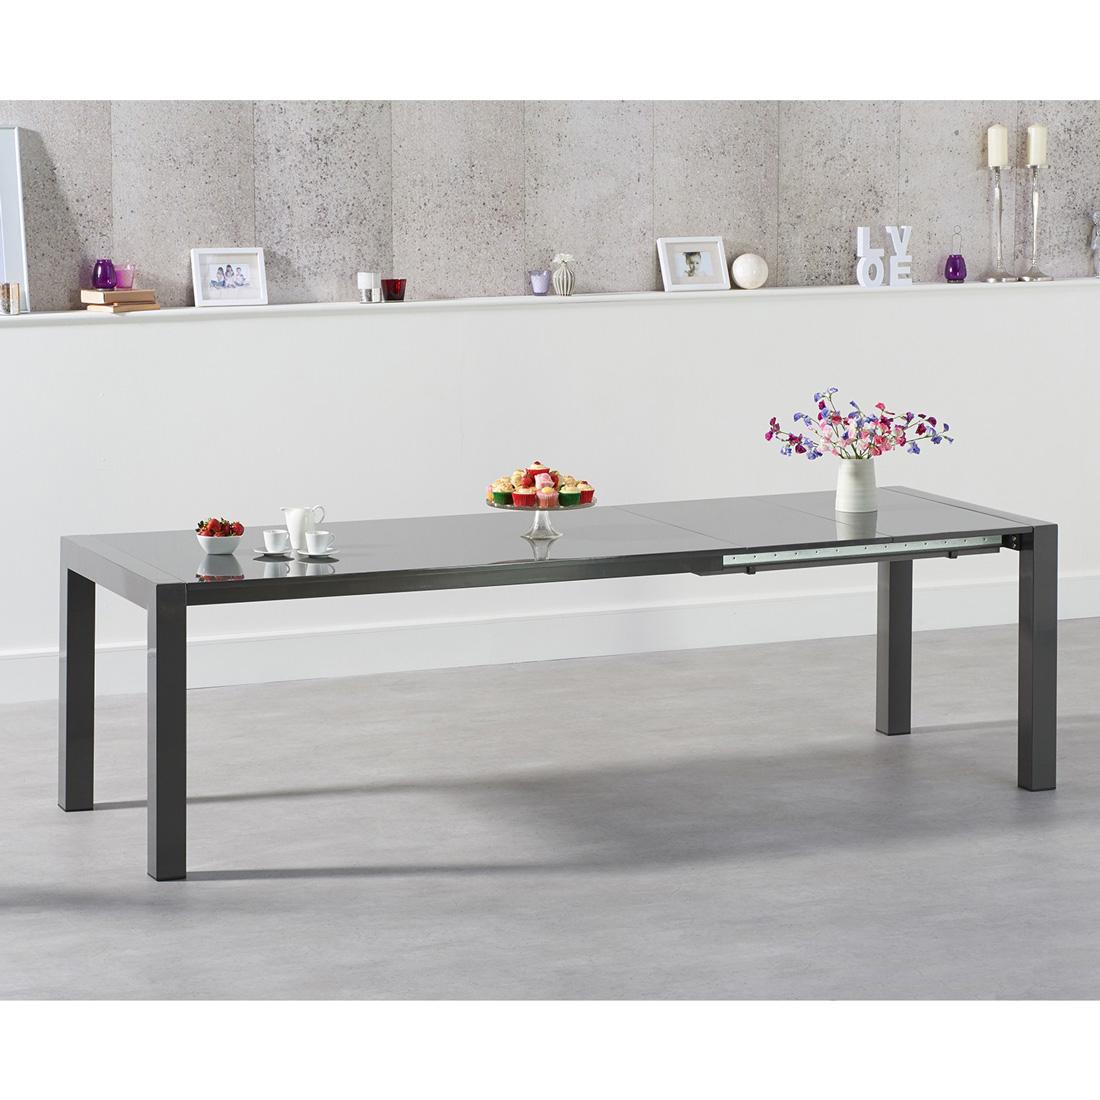 Jamie Extending Rectangular Dining Table Dark Grey Gloss - 6 to 10 seat